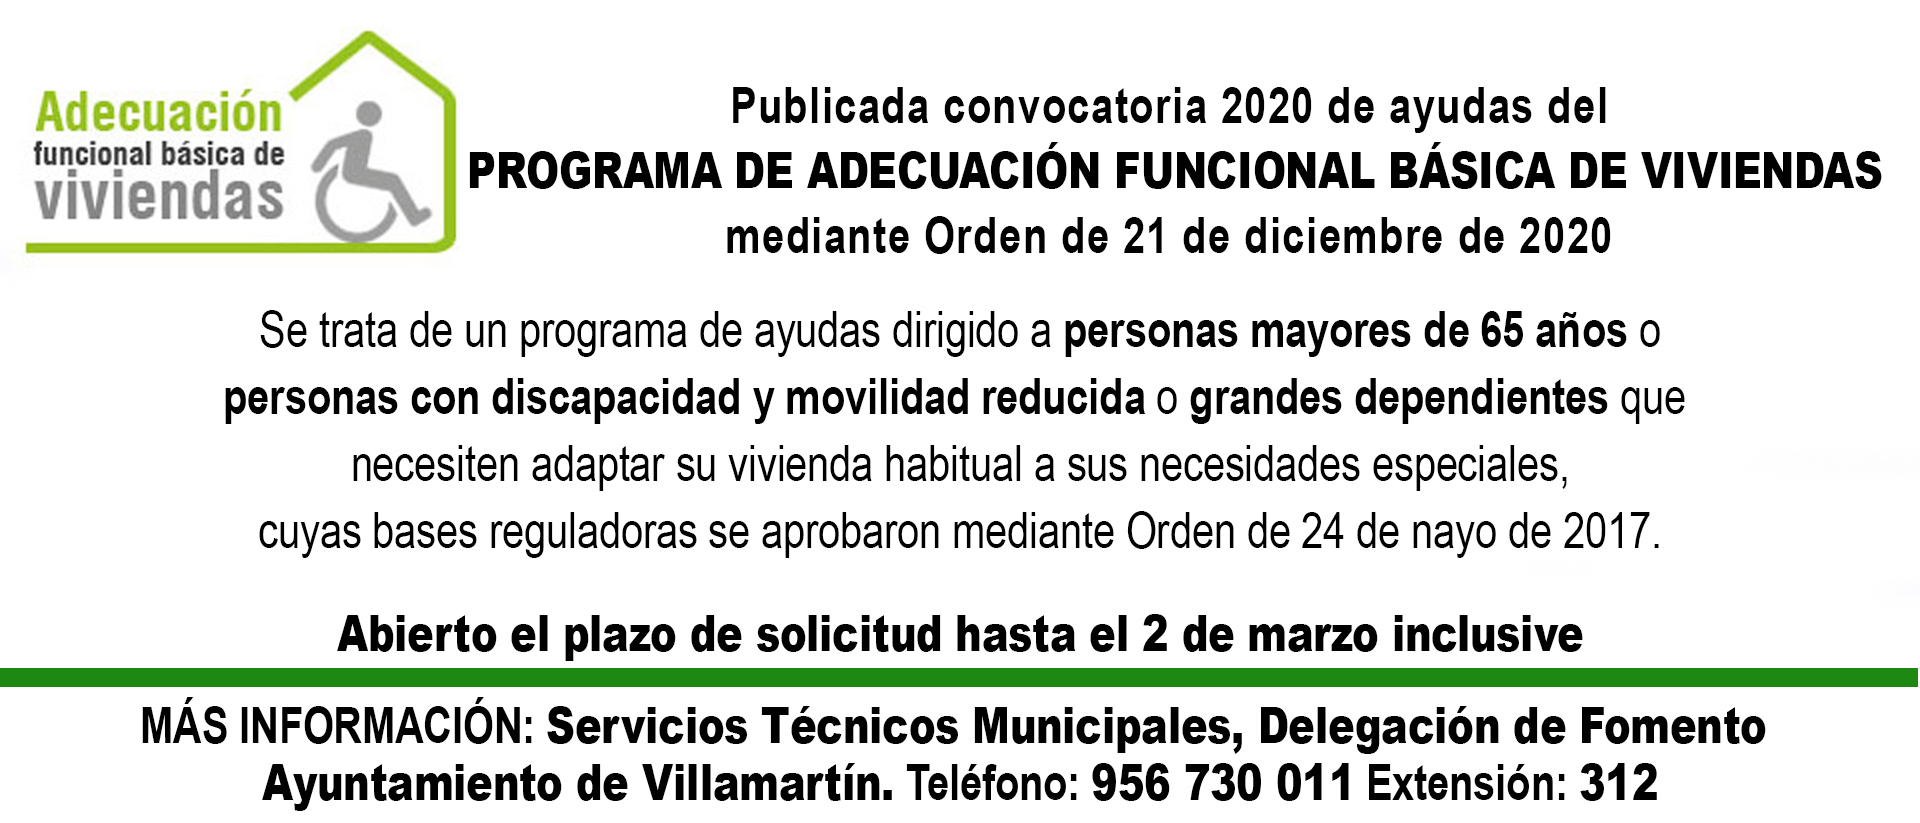 BANNER ADECUACION FUNCIONAL BASICA DE VIVIENDAS